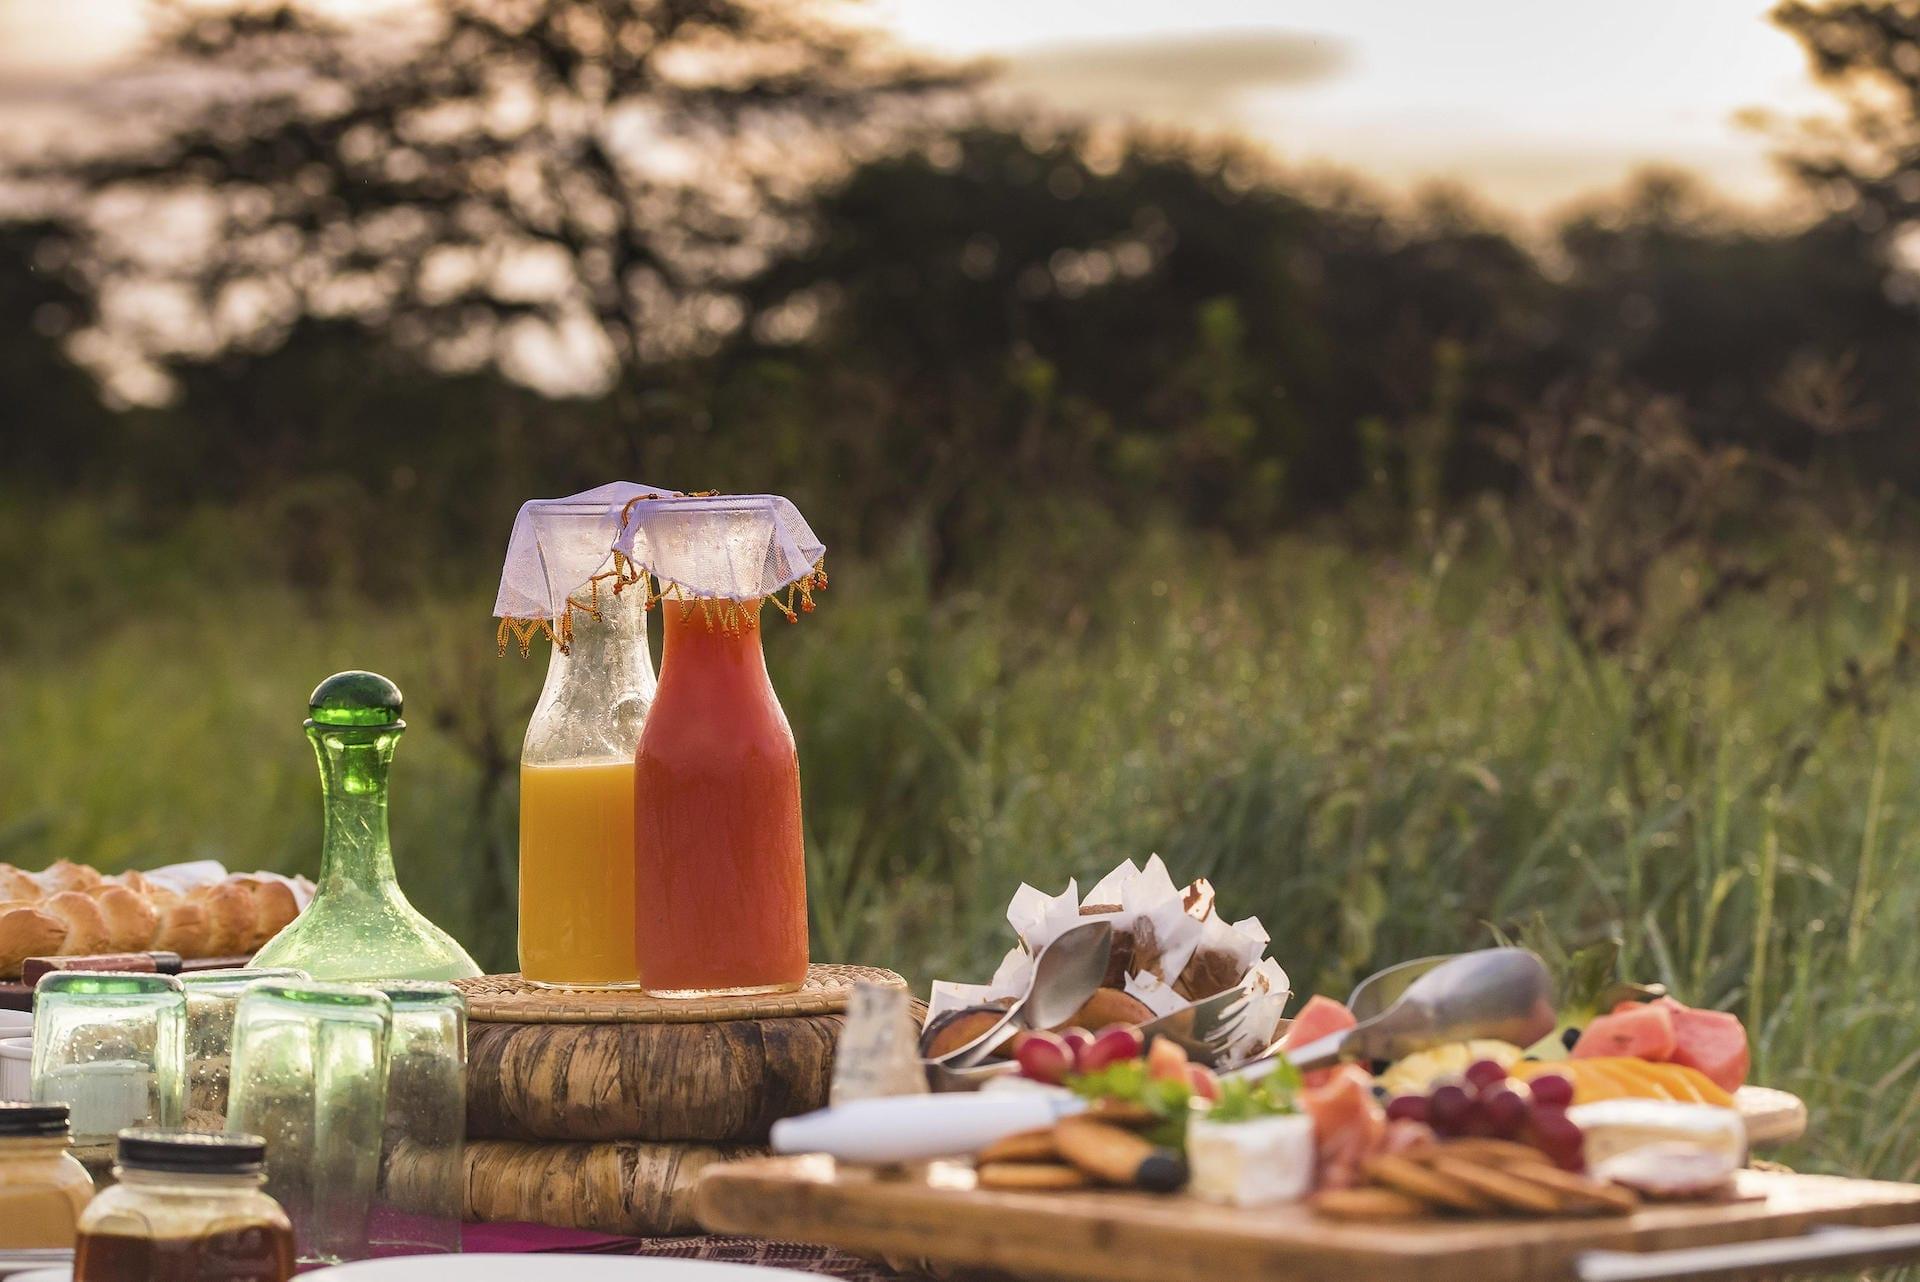 Dunia Bush breakfast set up